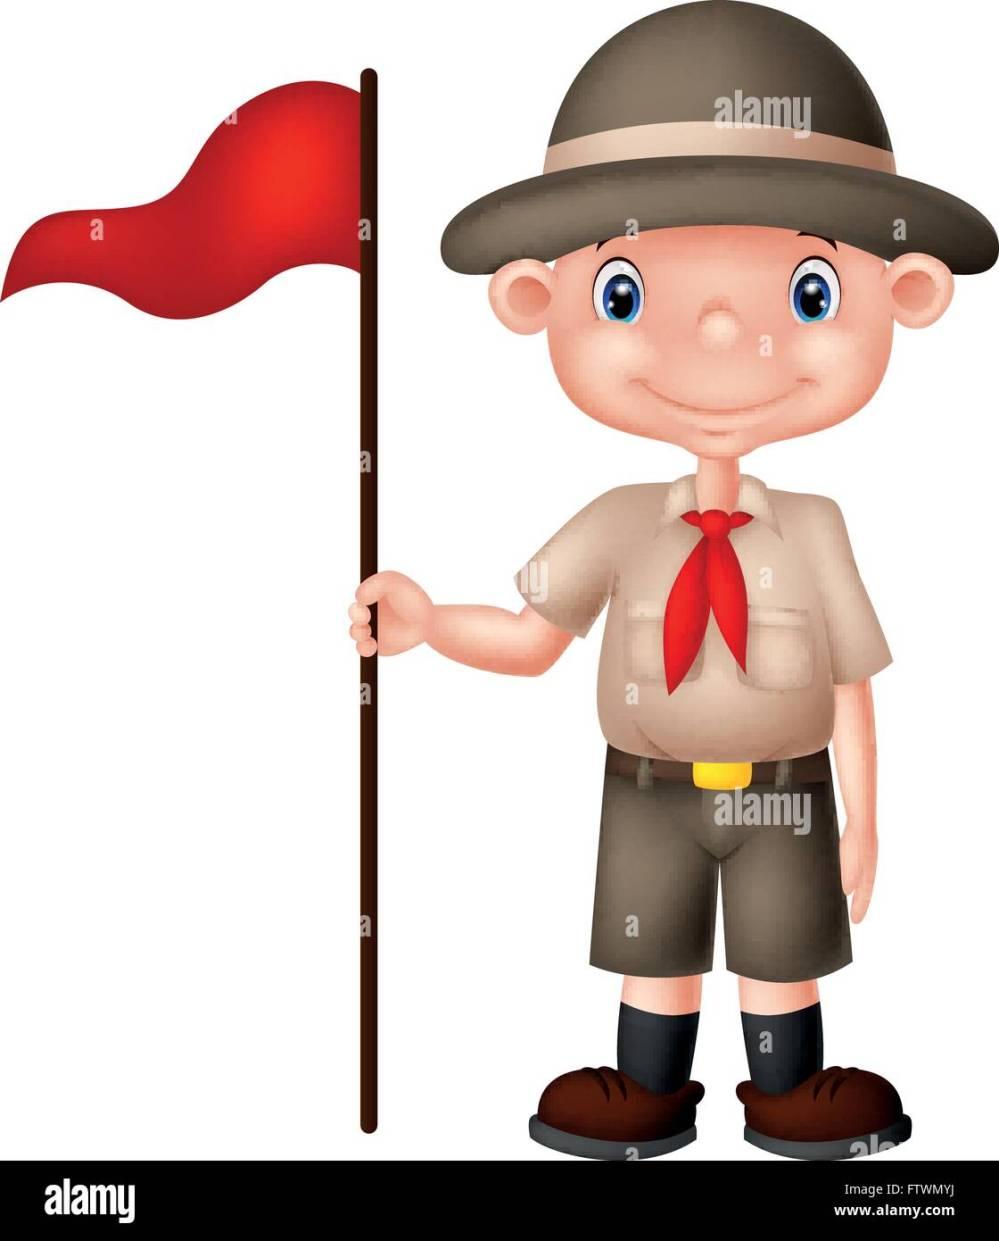 medium resolution of cartoon boy scout holding red flag